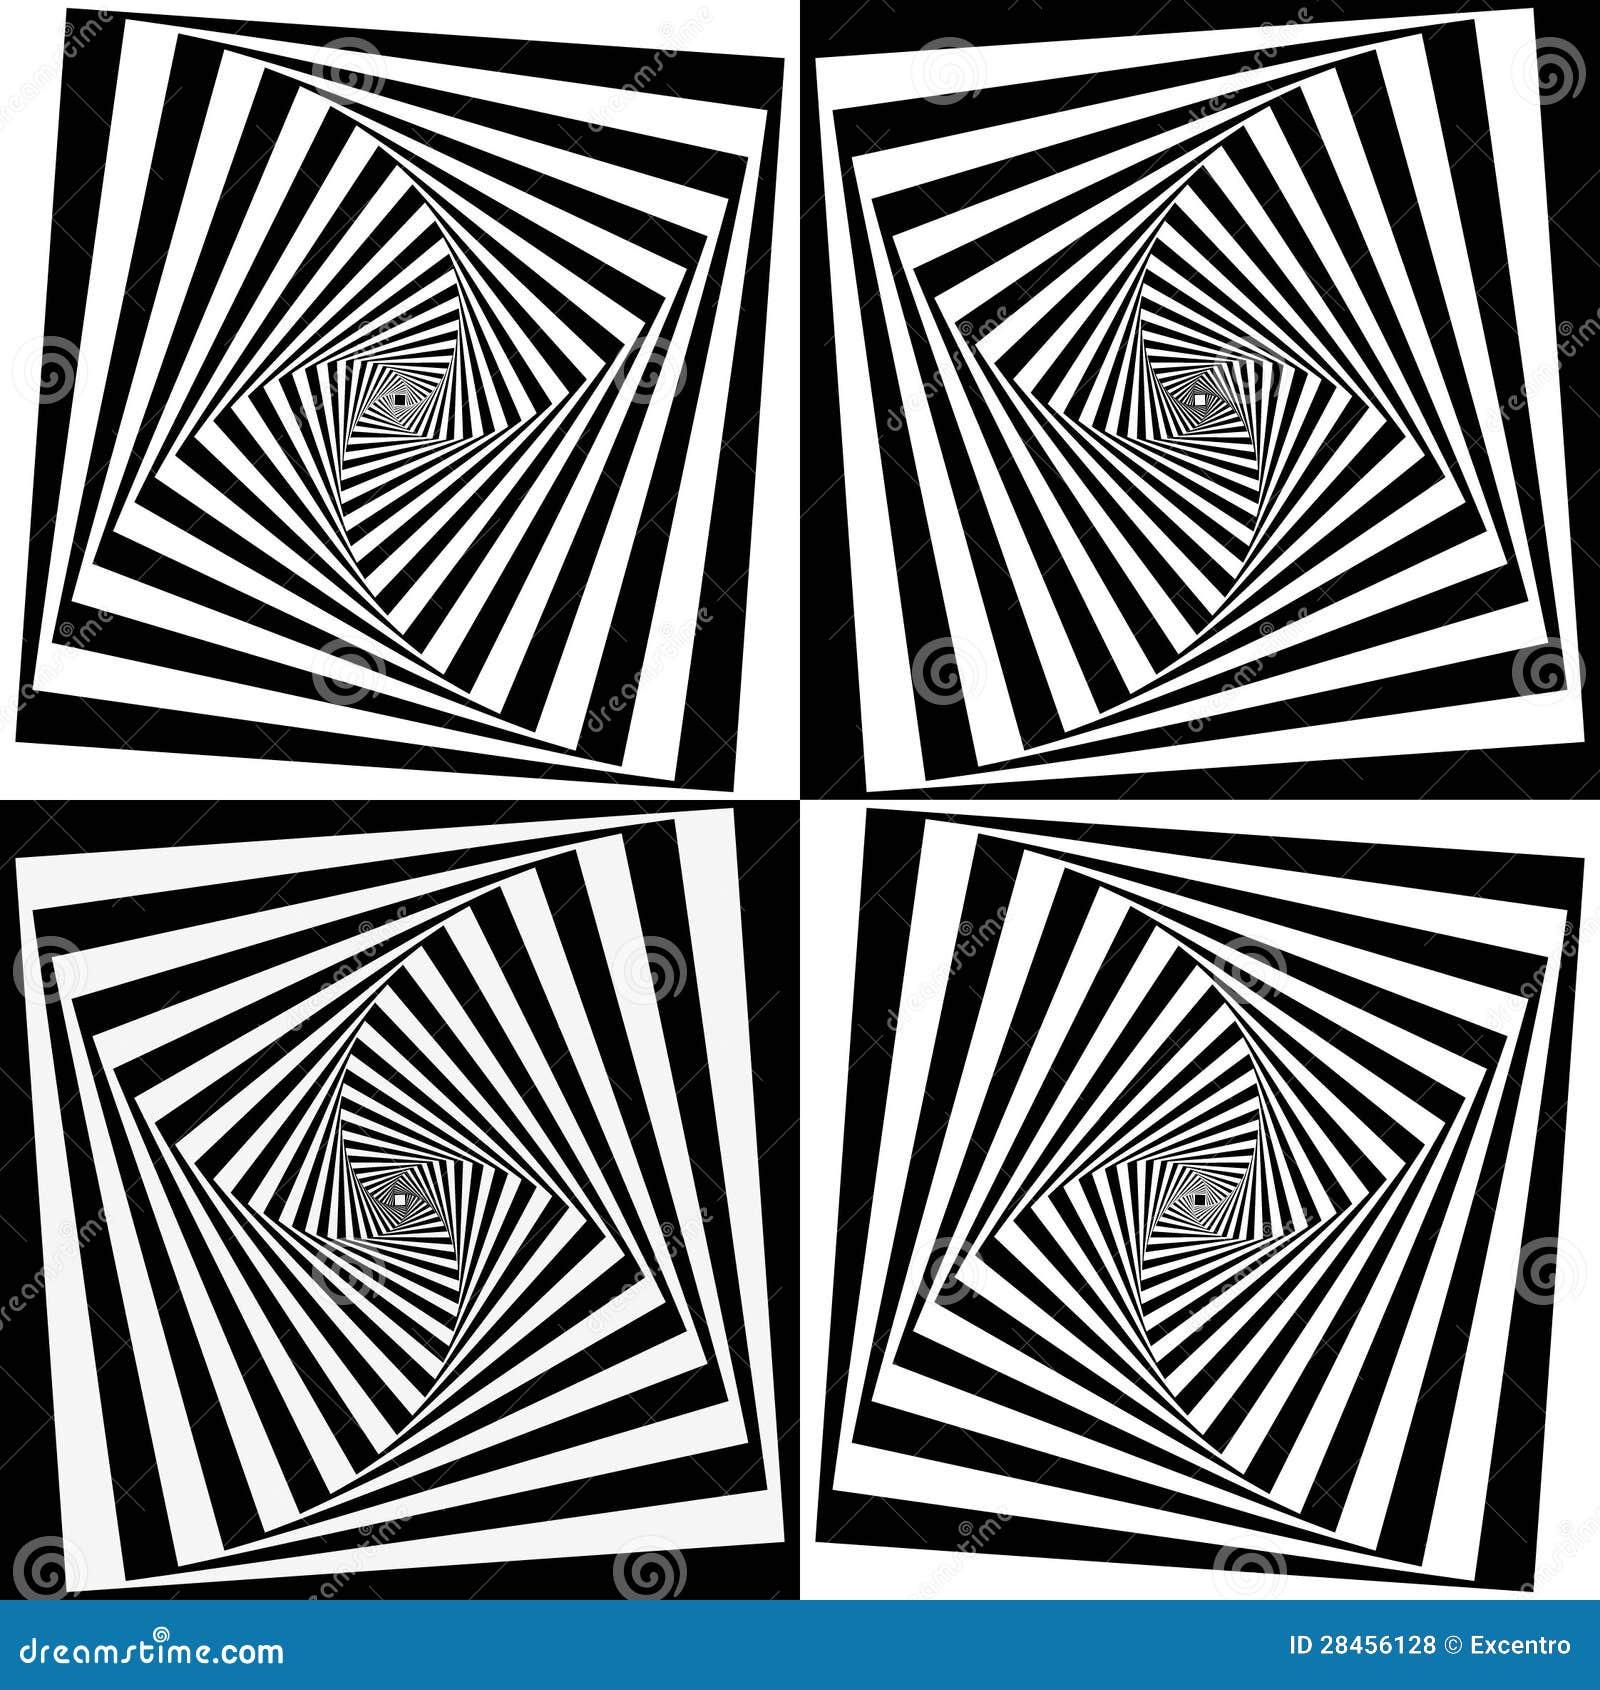 Optical Art Stock Vector. Illustration Of Mobius